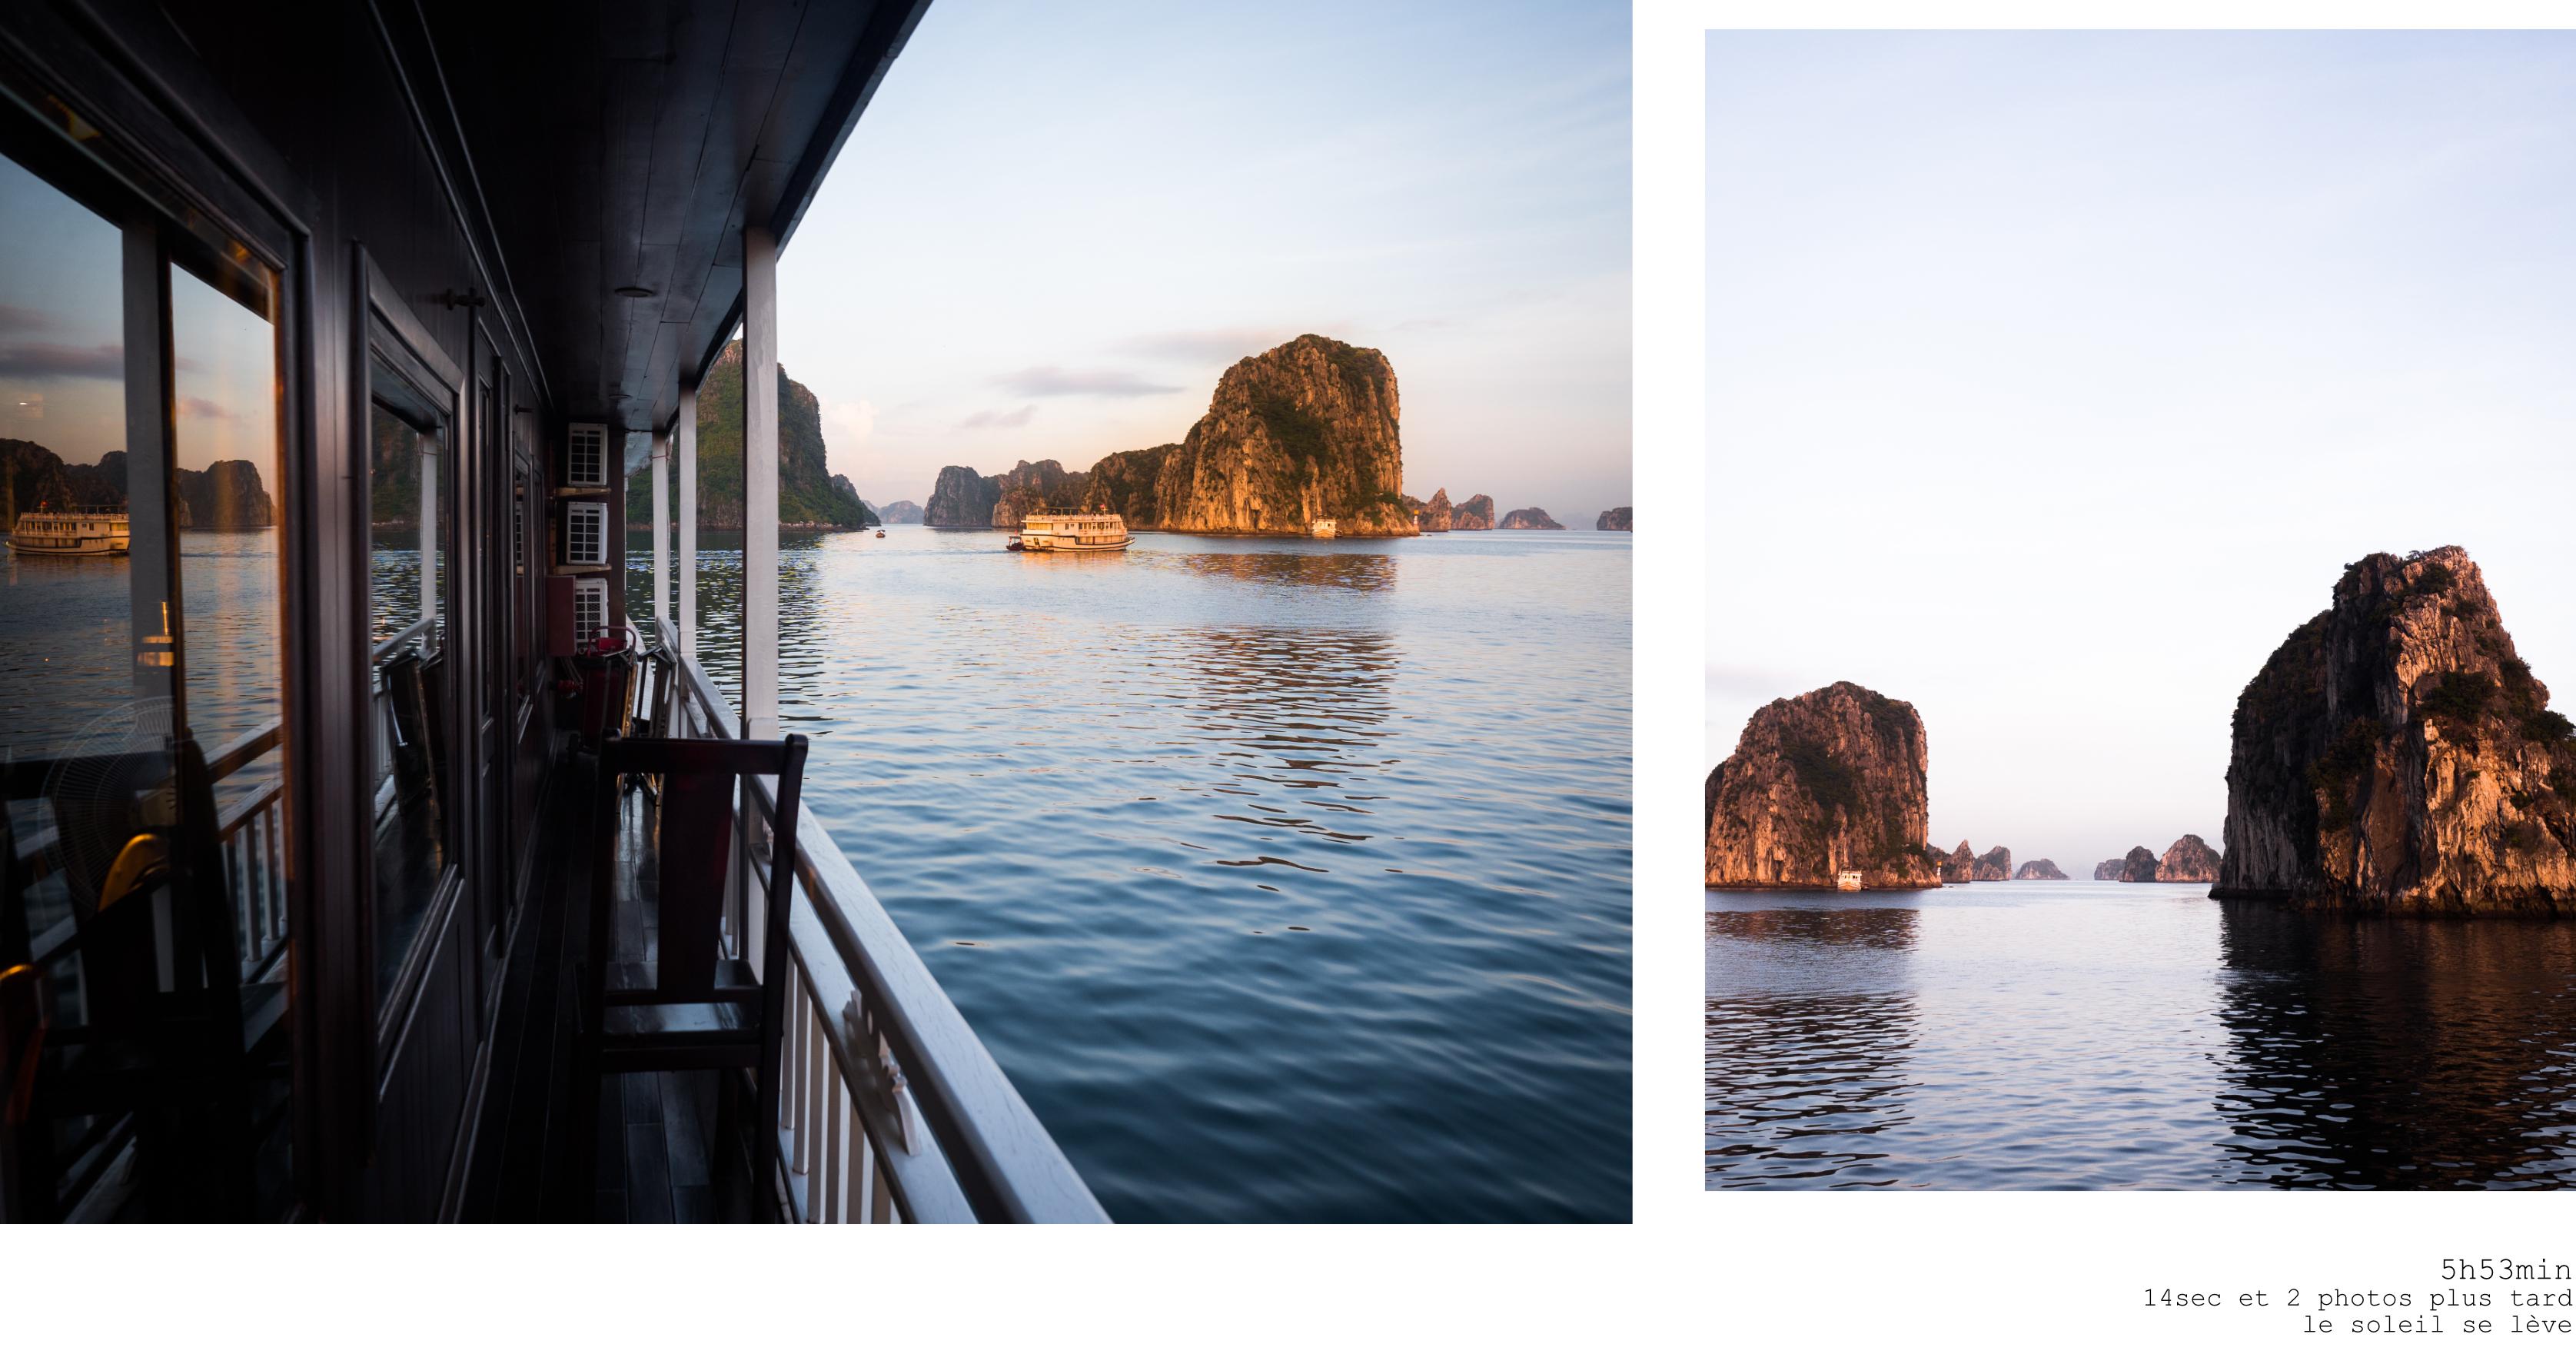 vietnam - bai tu long bay en jonque - baie d'halong